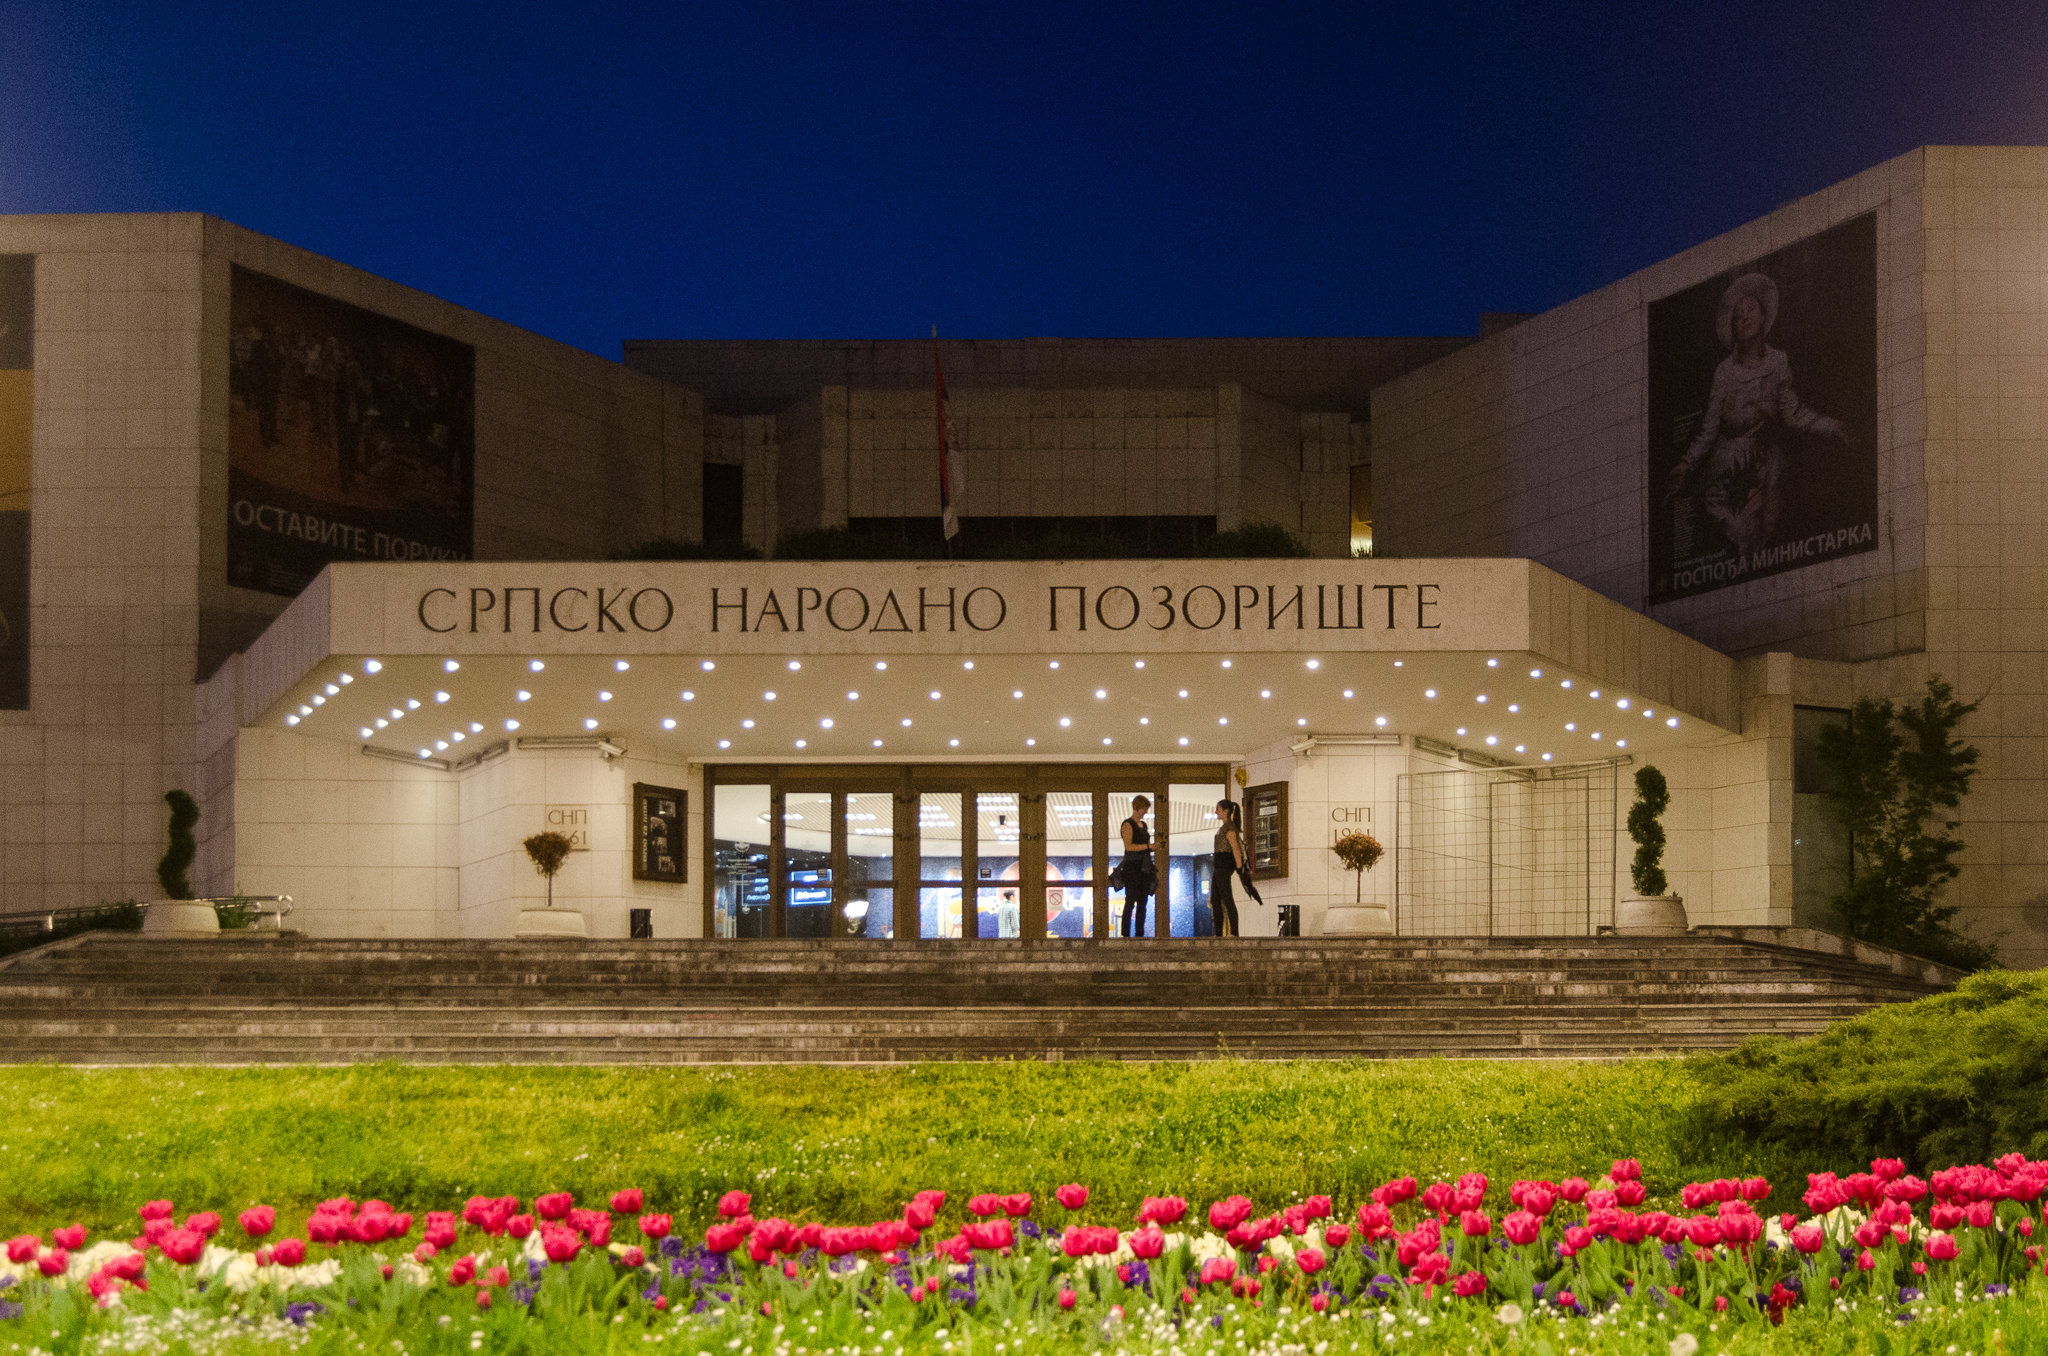 narodno pozoriste beograd mapa Srpsko narodno pozorište | I love Novi Sad narodno pozoriste beograd mapa